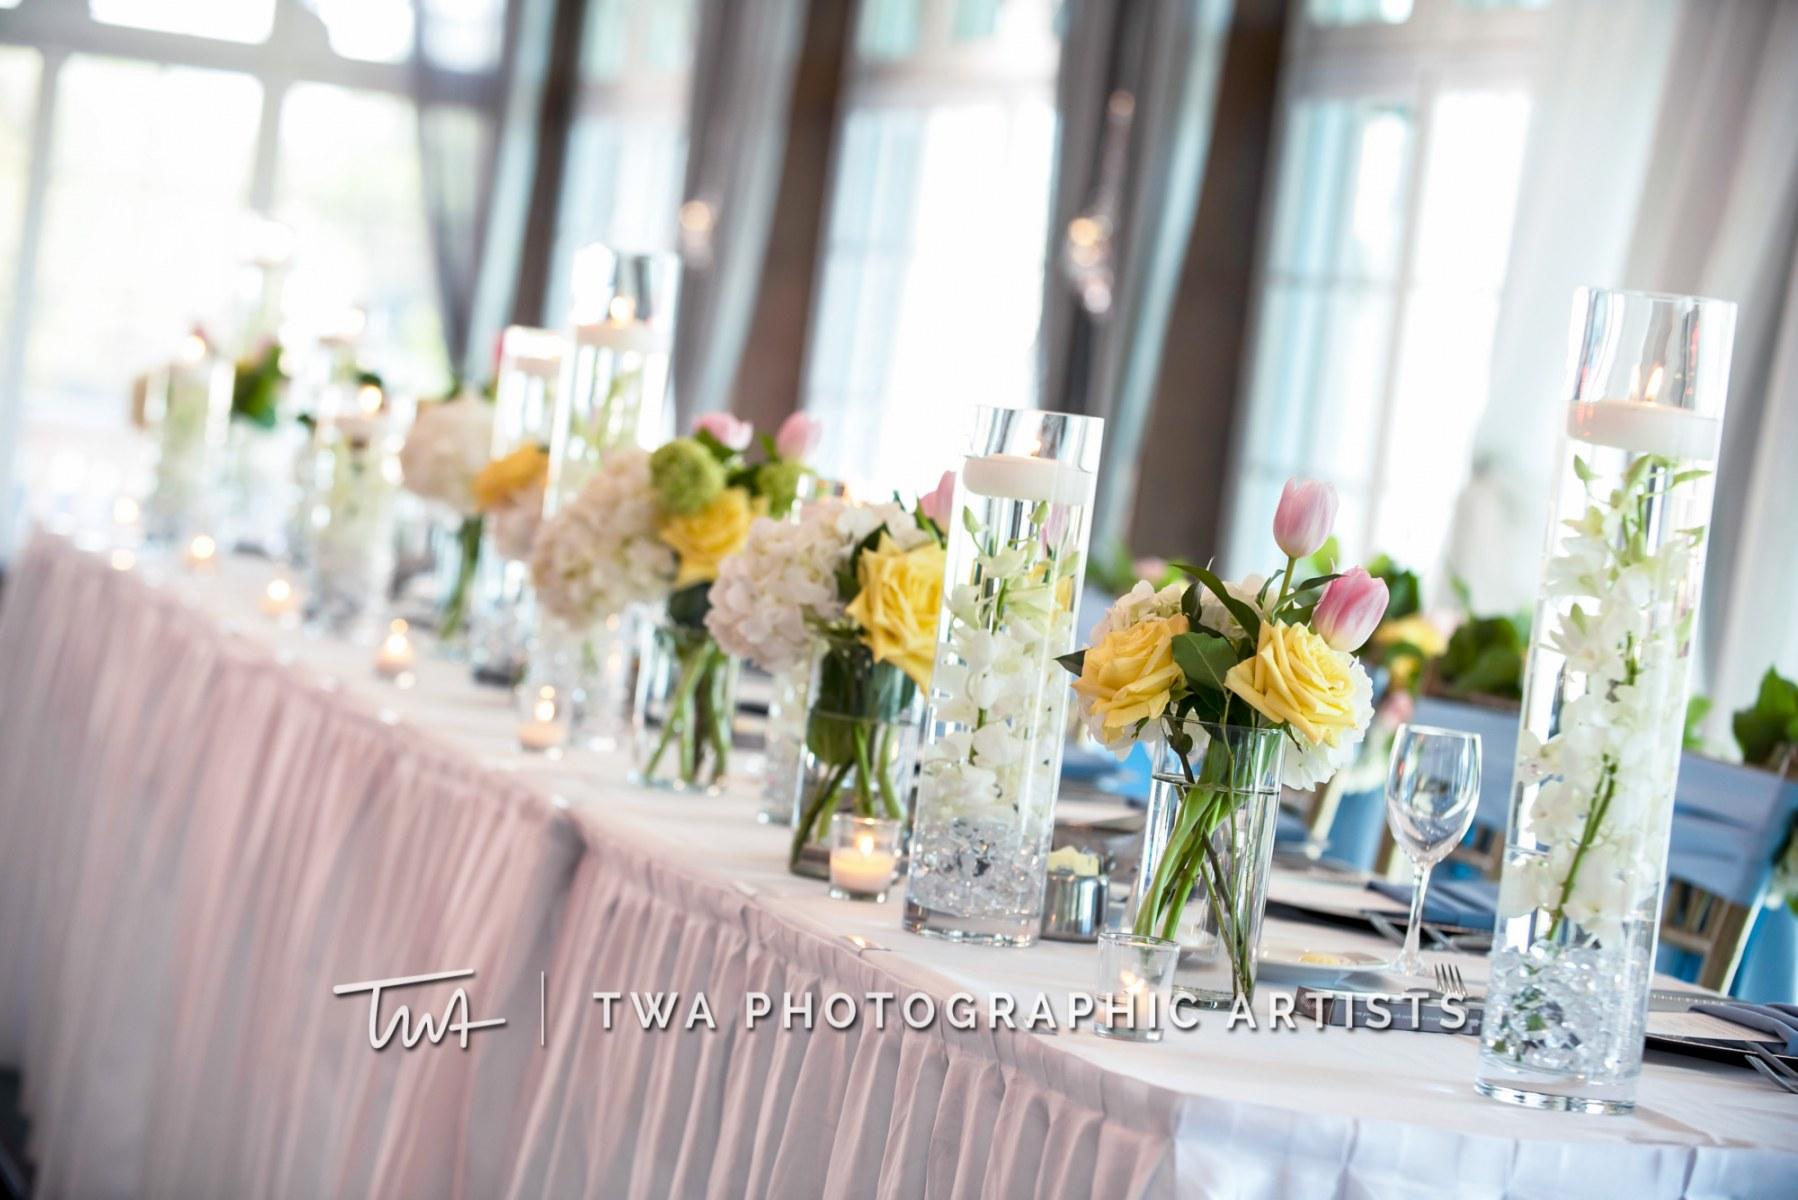 Chicago-Wedding-Photographer-TWA-Photographic-Artists-Drake-Hotel_Bermas_Zweifel_JP_GP-0542